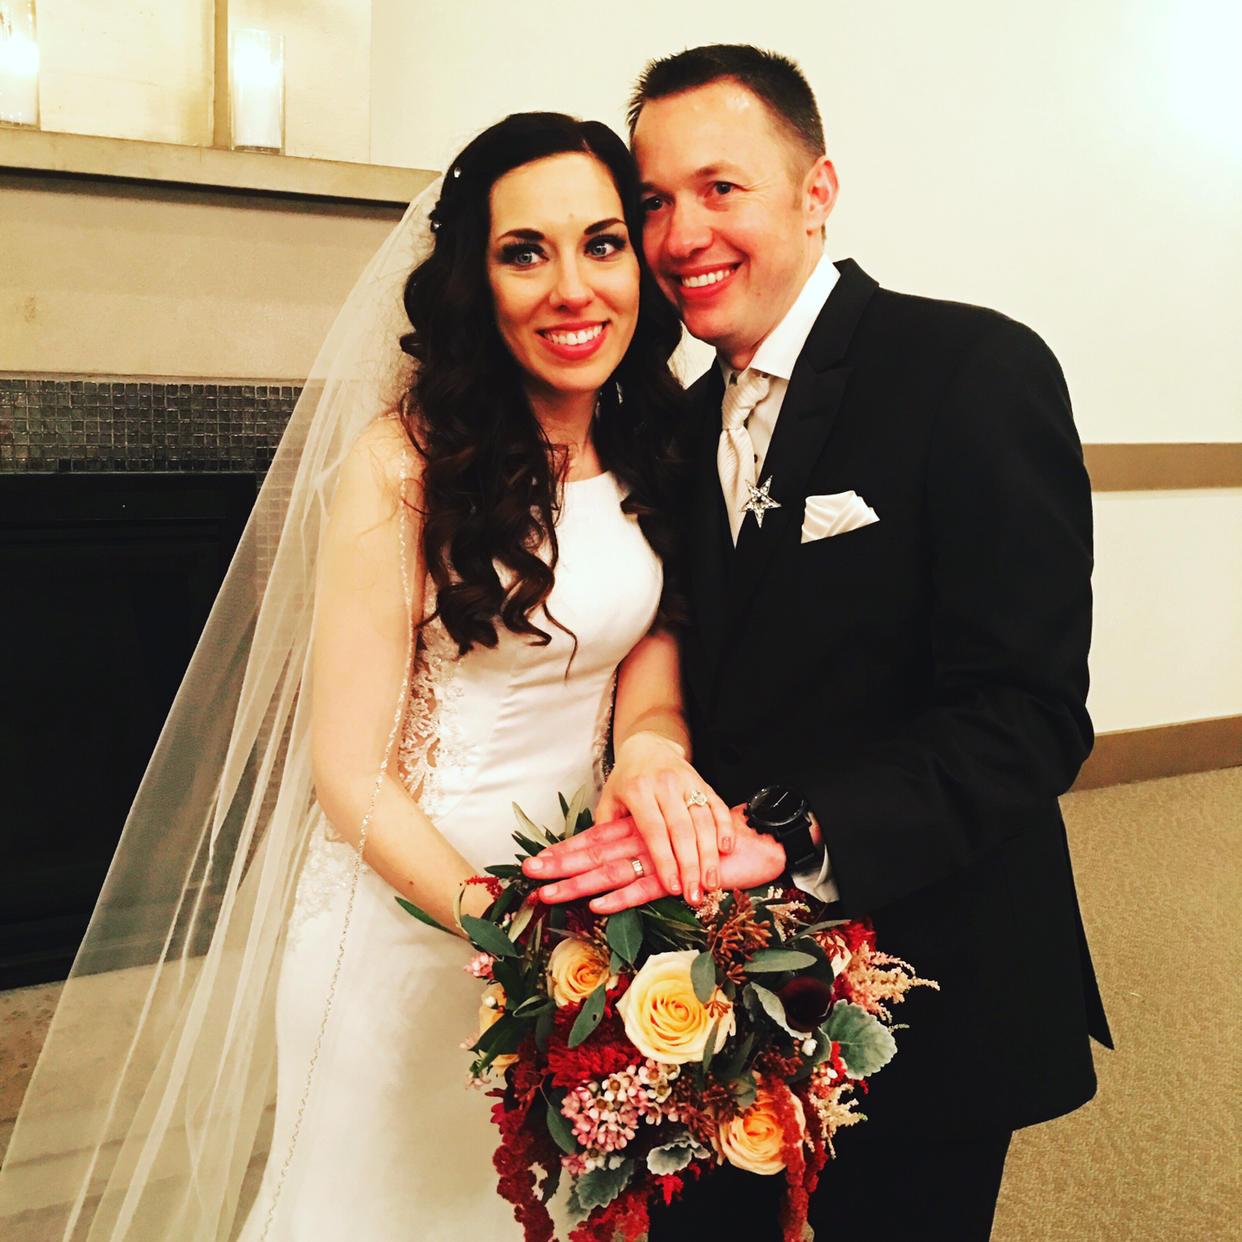 Sureshot Productions: Chicago Wedding Video image 4